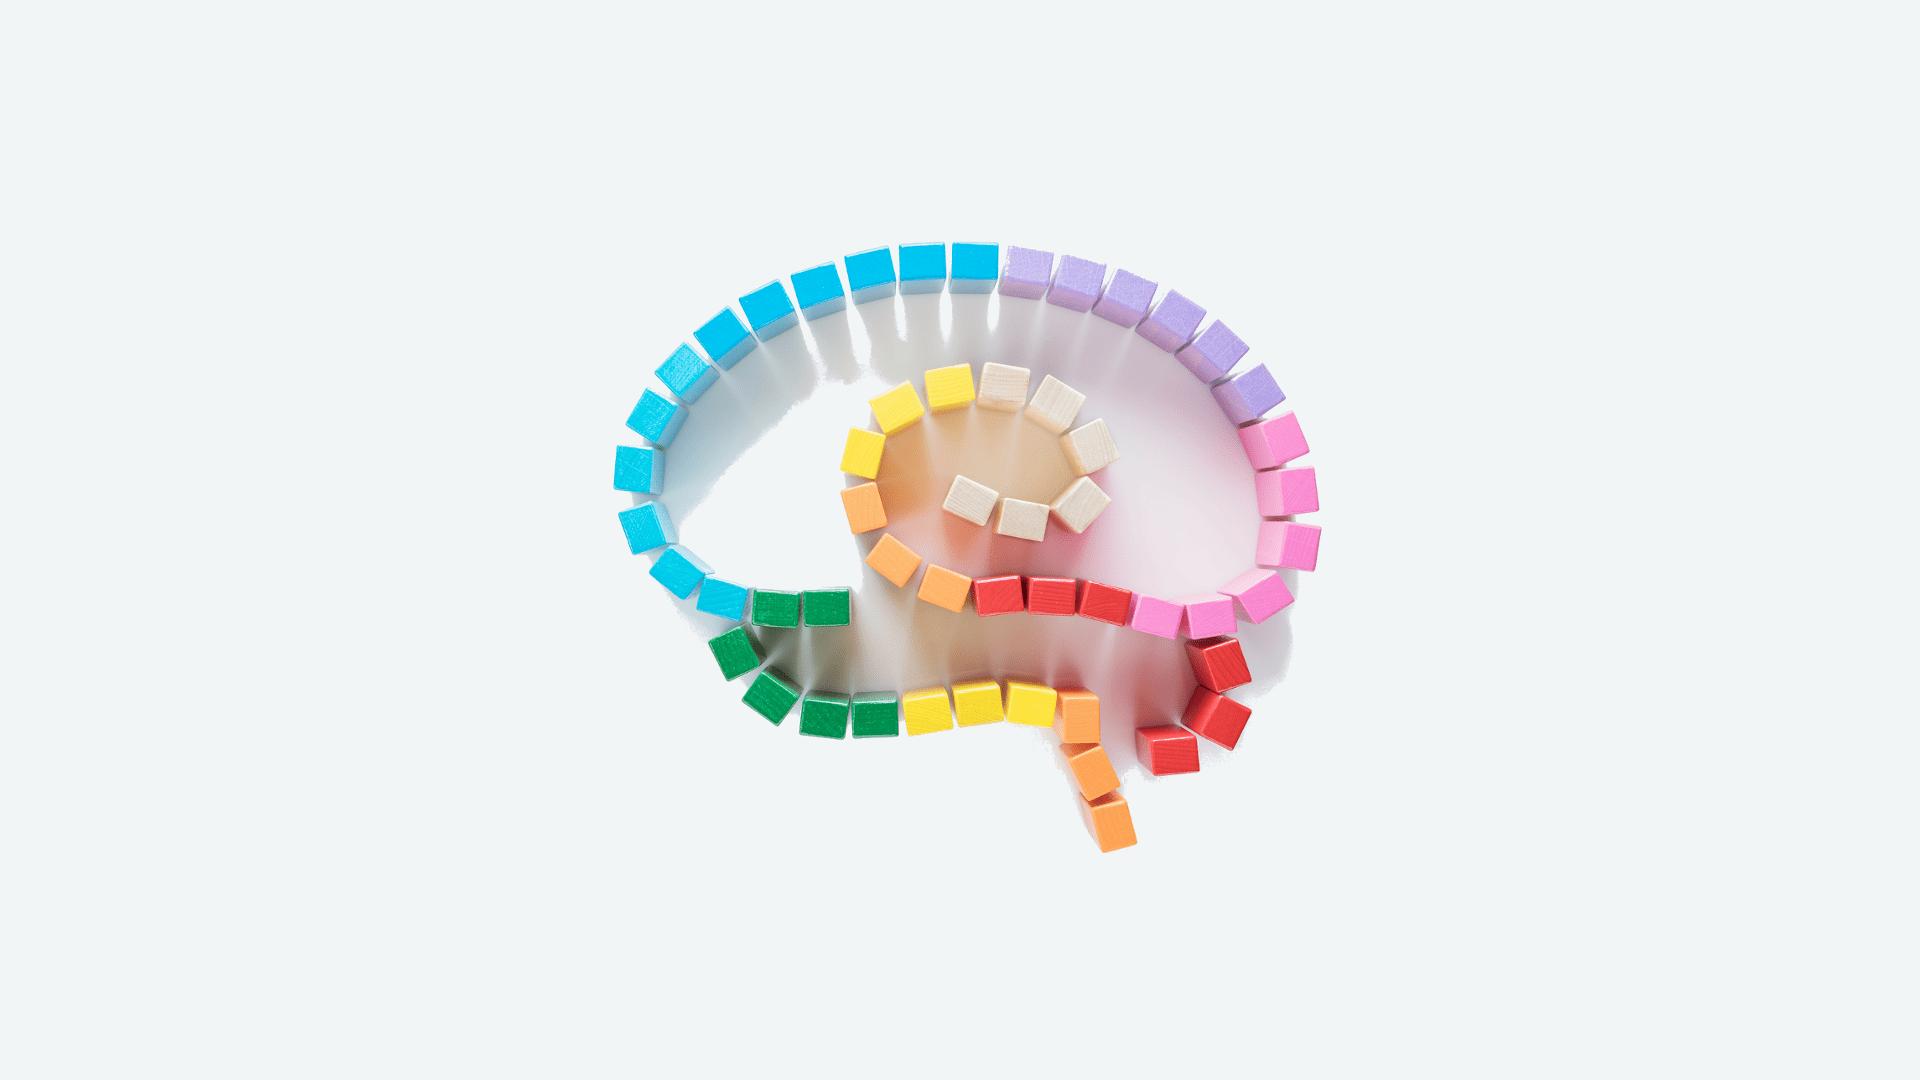 Cerebro con bloques de madera